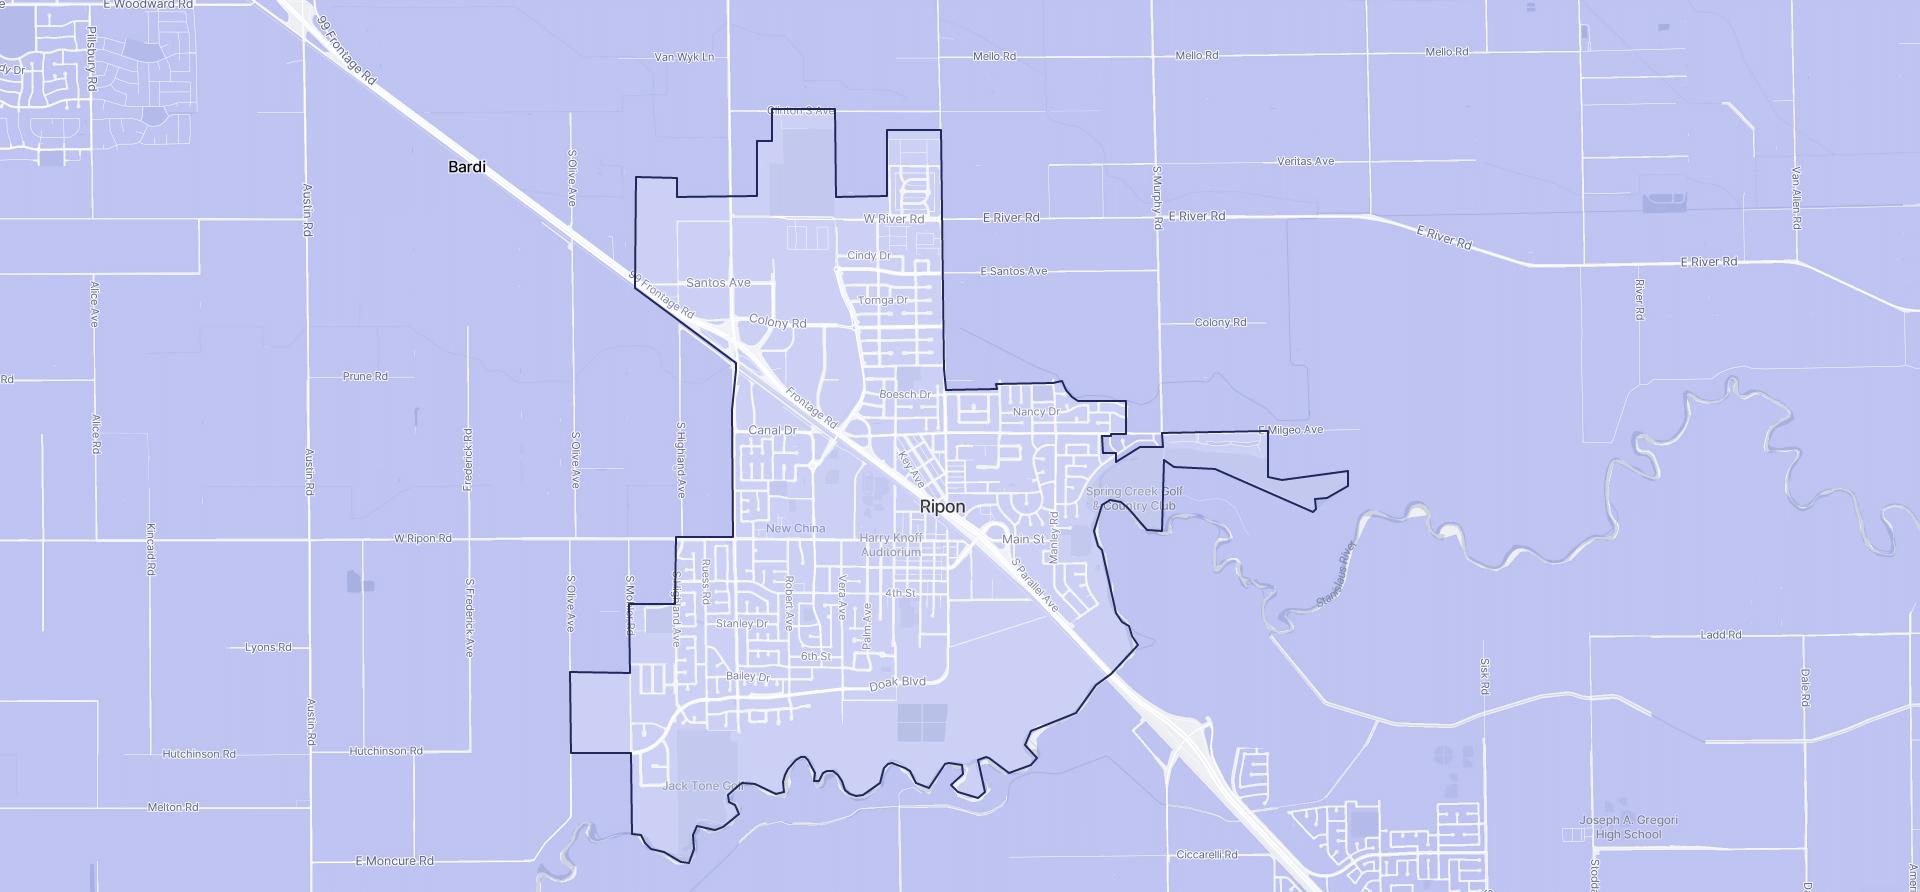 Image of Ripon boundaries on a map.